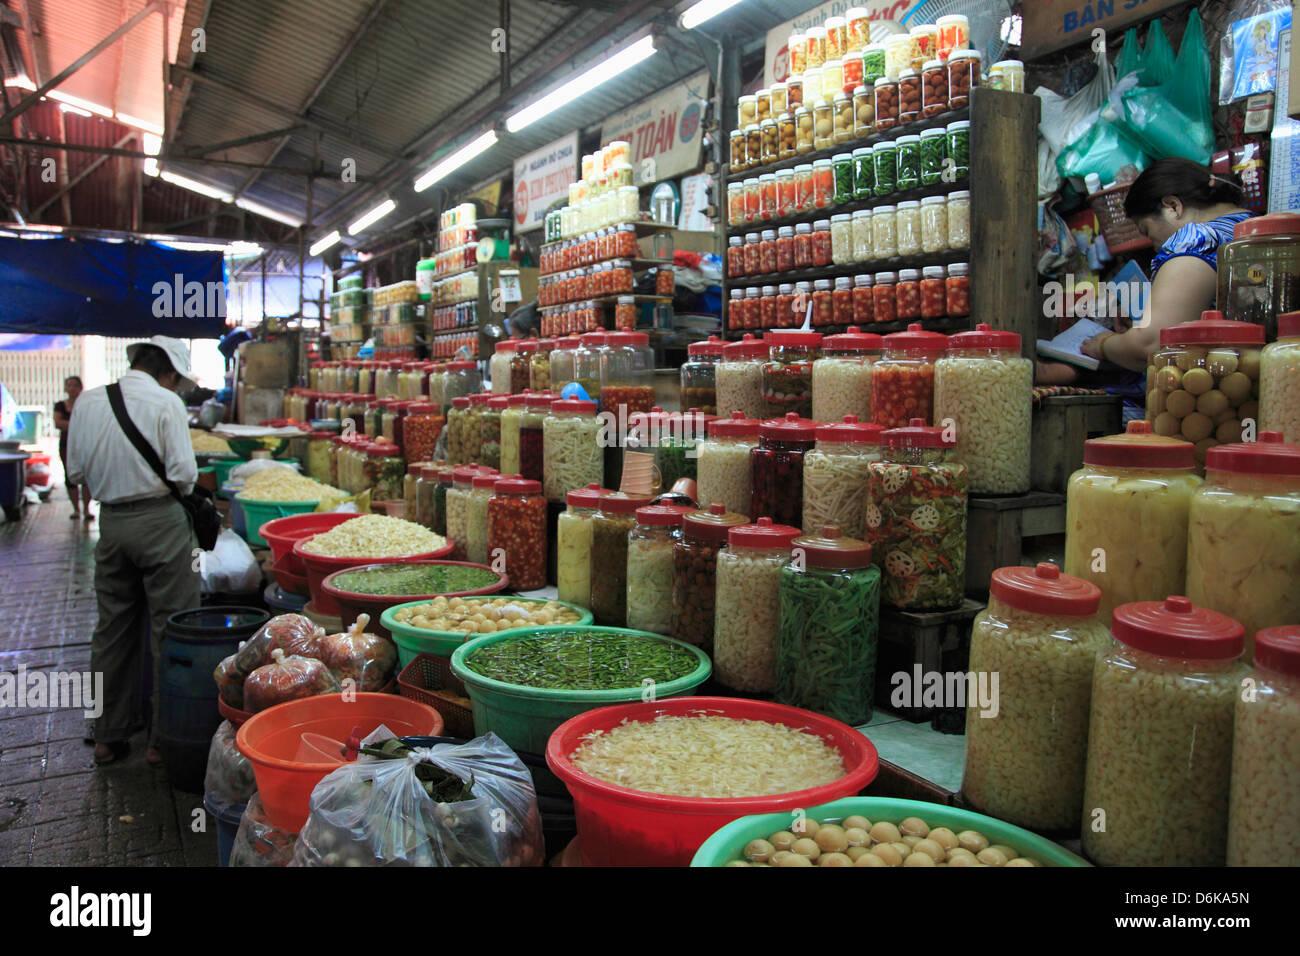 Binh Tay Market, Cholon, Chinatown, Ho Chi Minh City (Saigon), Vietnam, Indochina, Southeast Asia, Asia - Stock Image